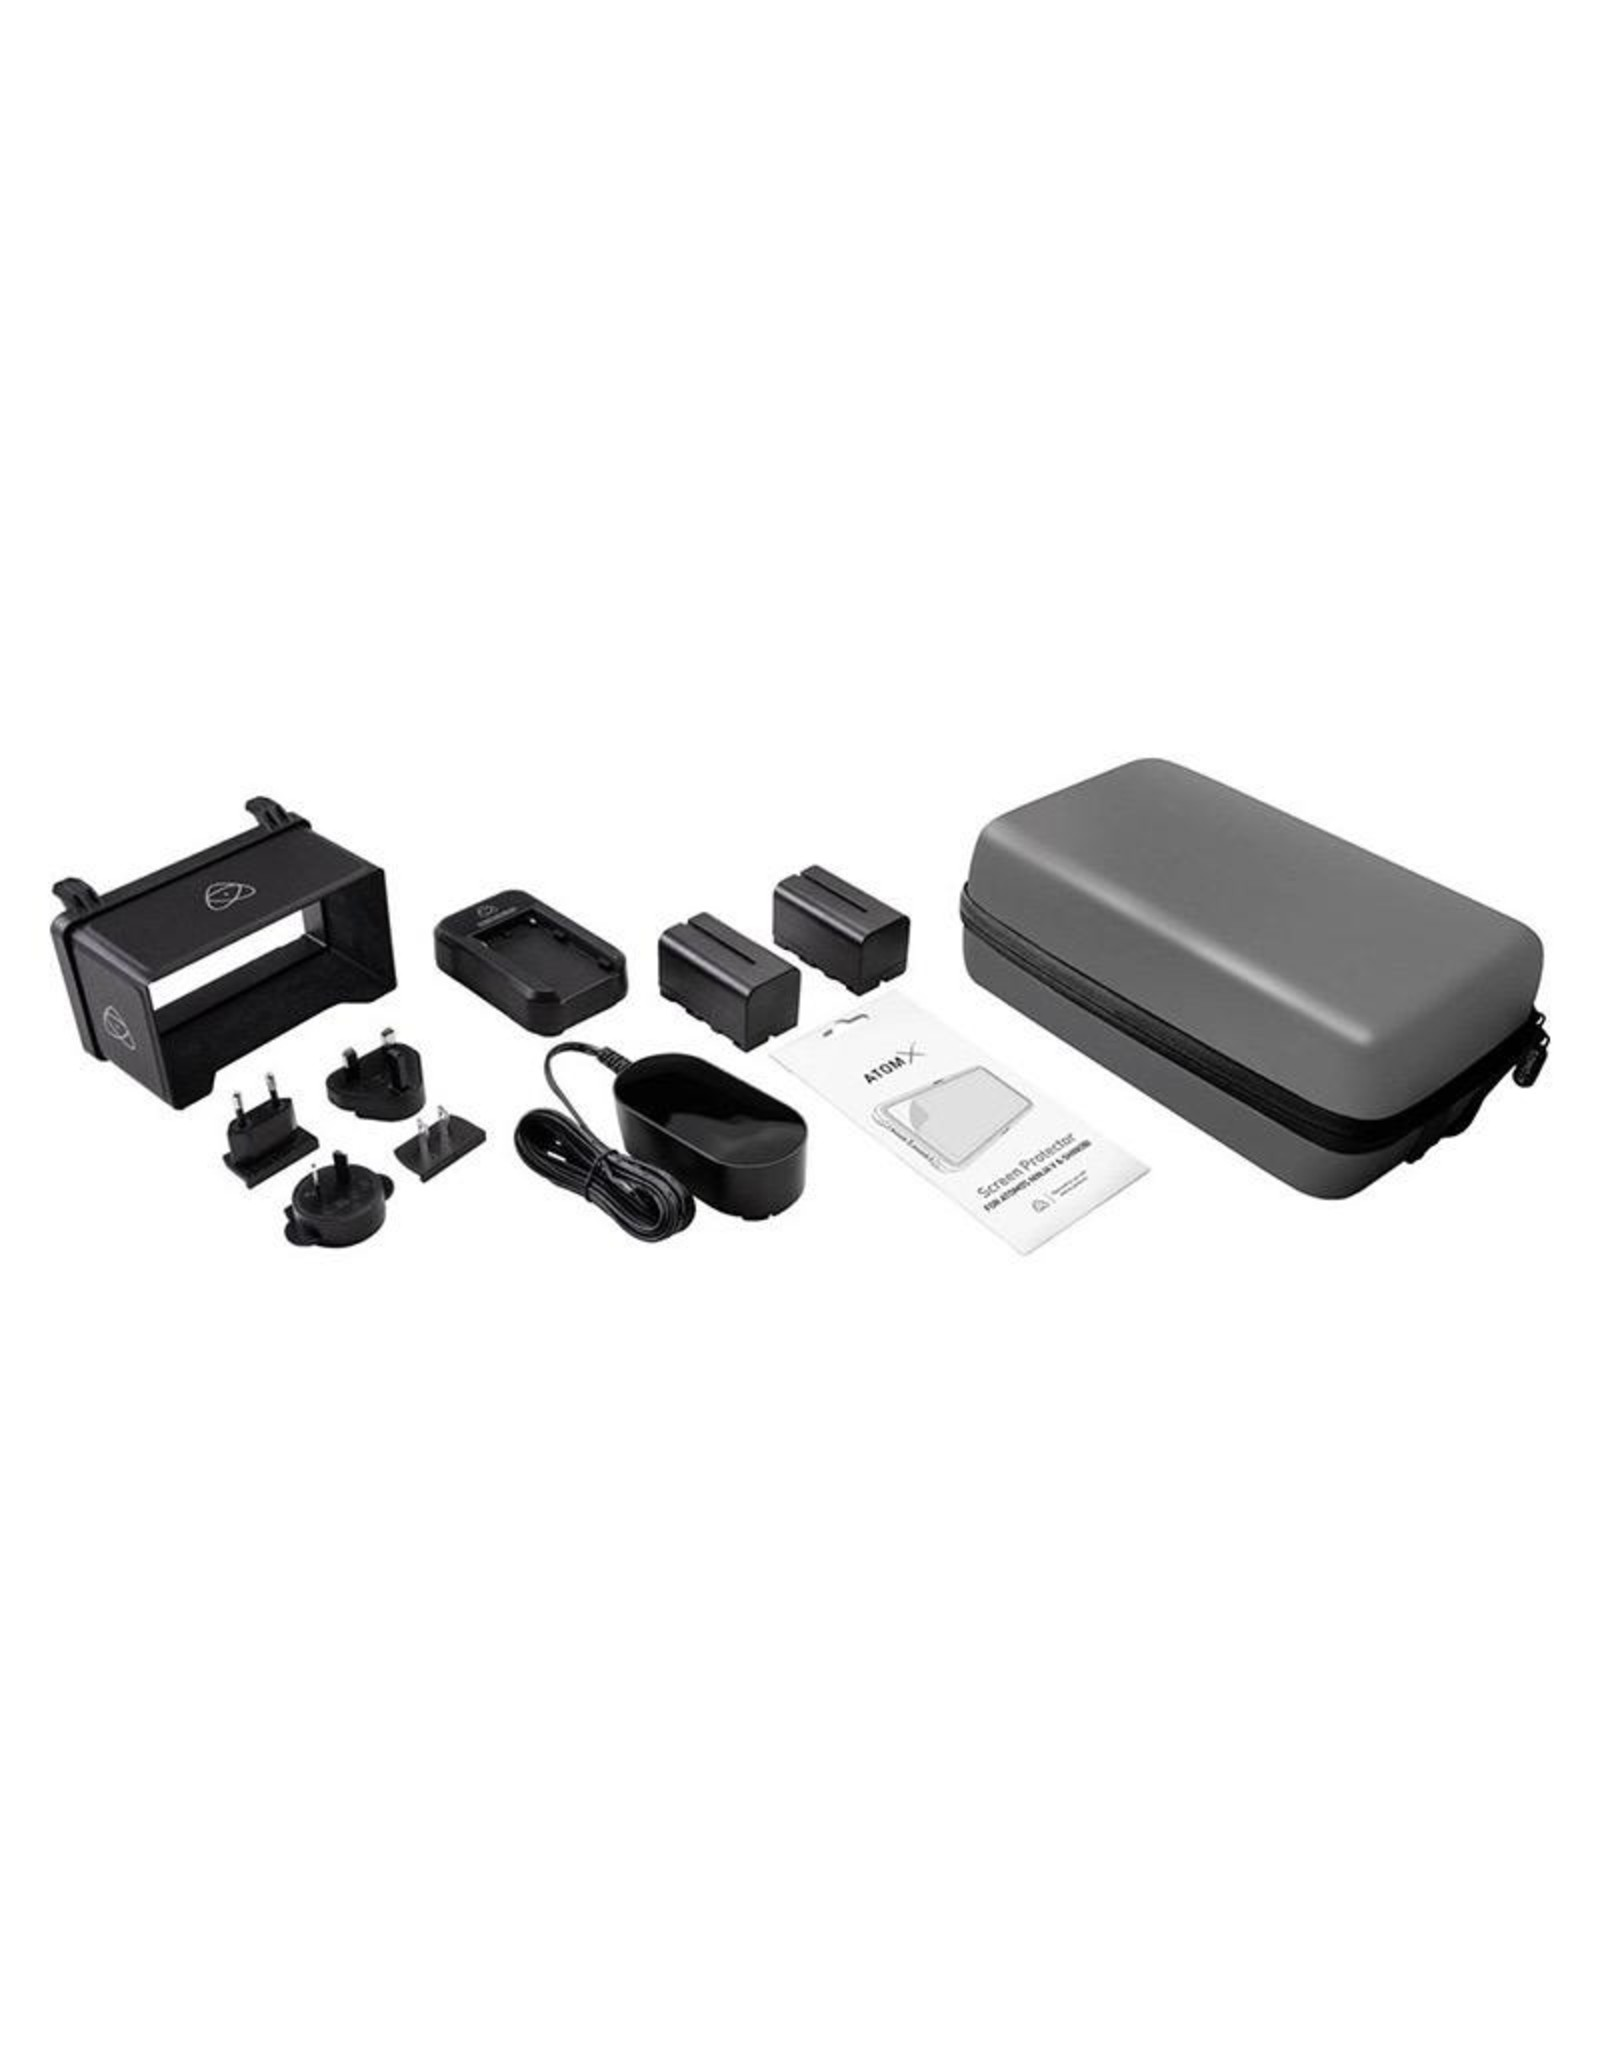 Atomos Shinobi SDI Accessory Kit